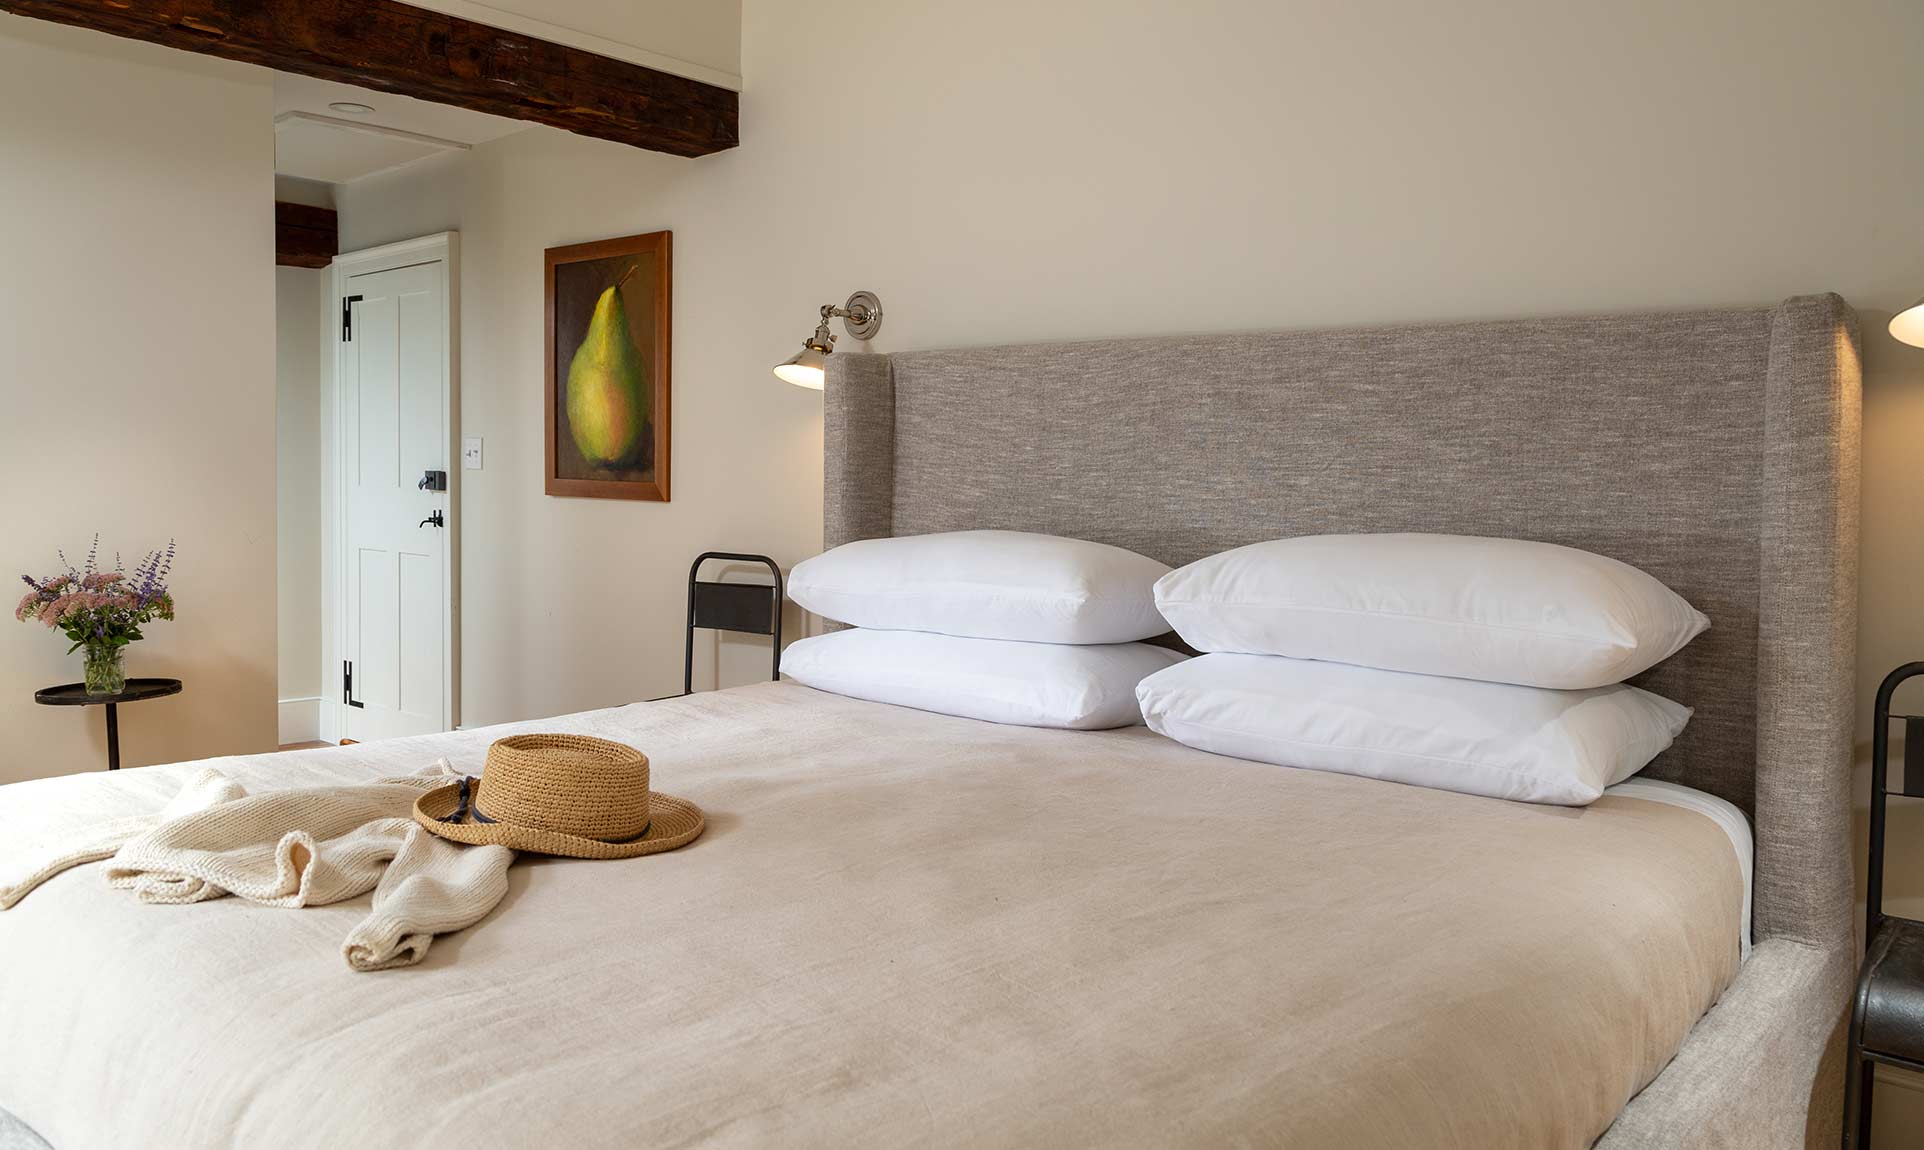 Nickerson Room Bed